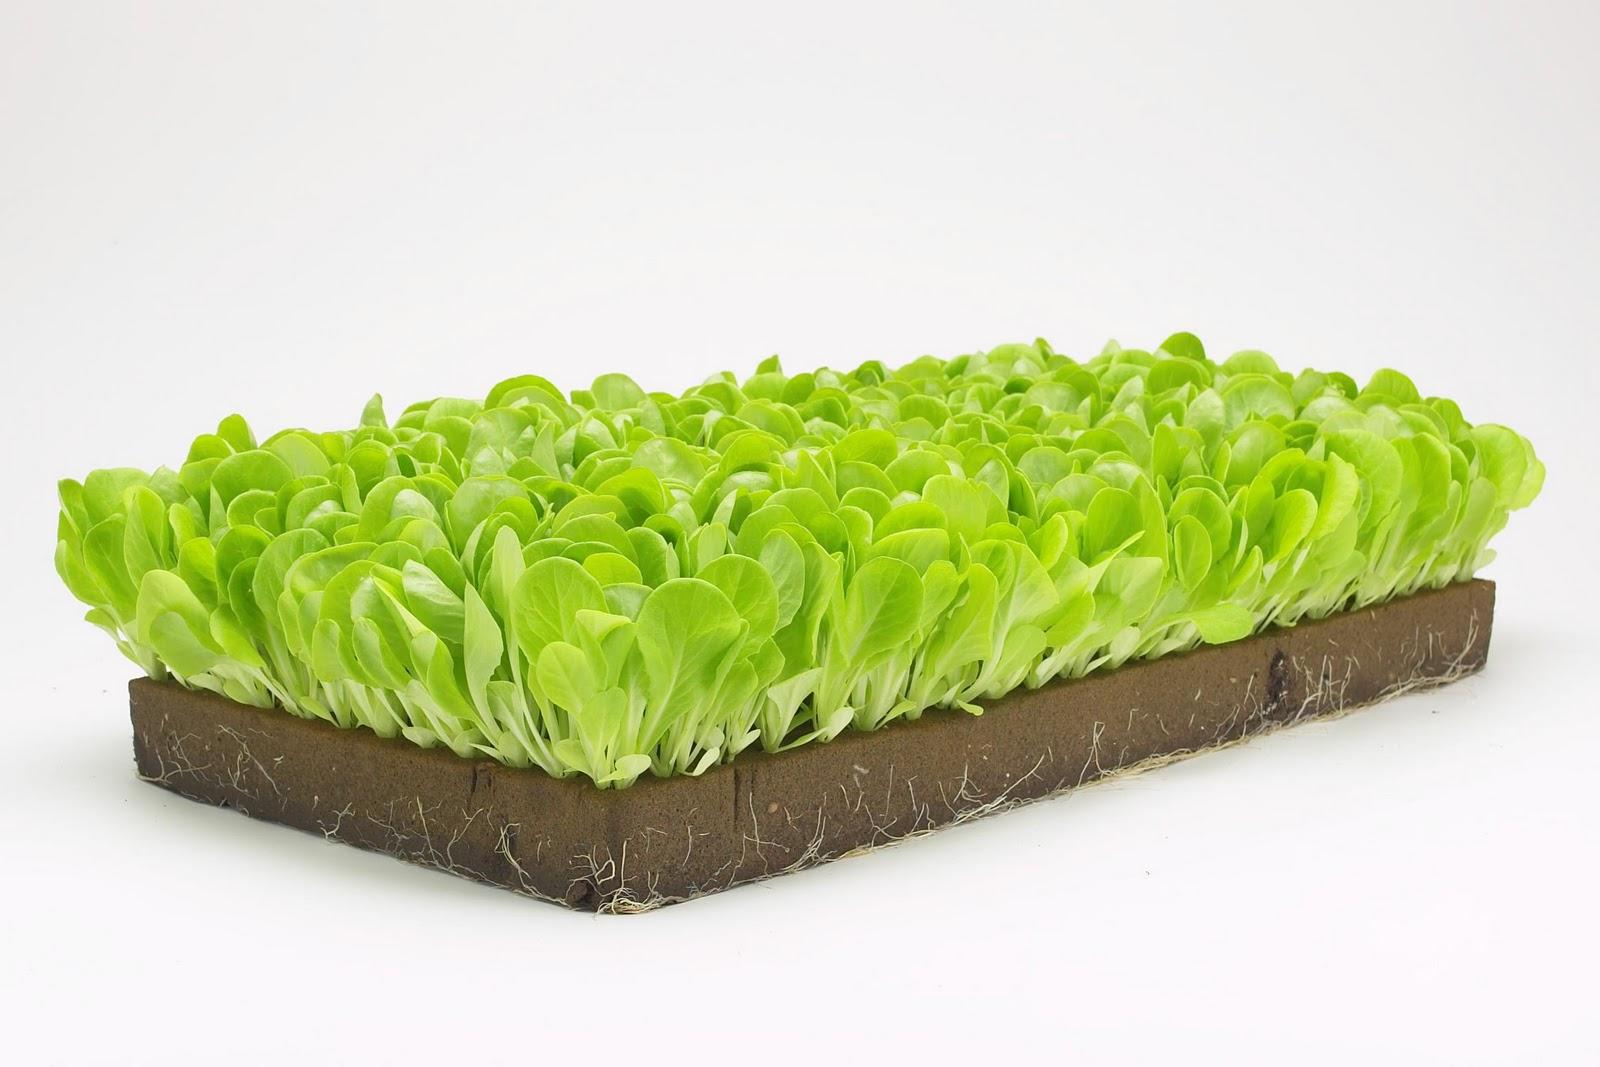 Hydroponic Lettuce Production in Phenolic Foam | Hort Americas